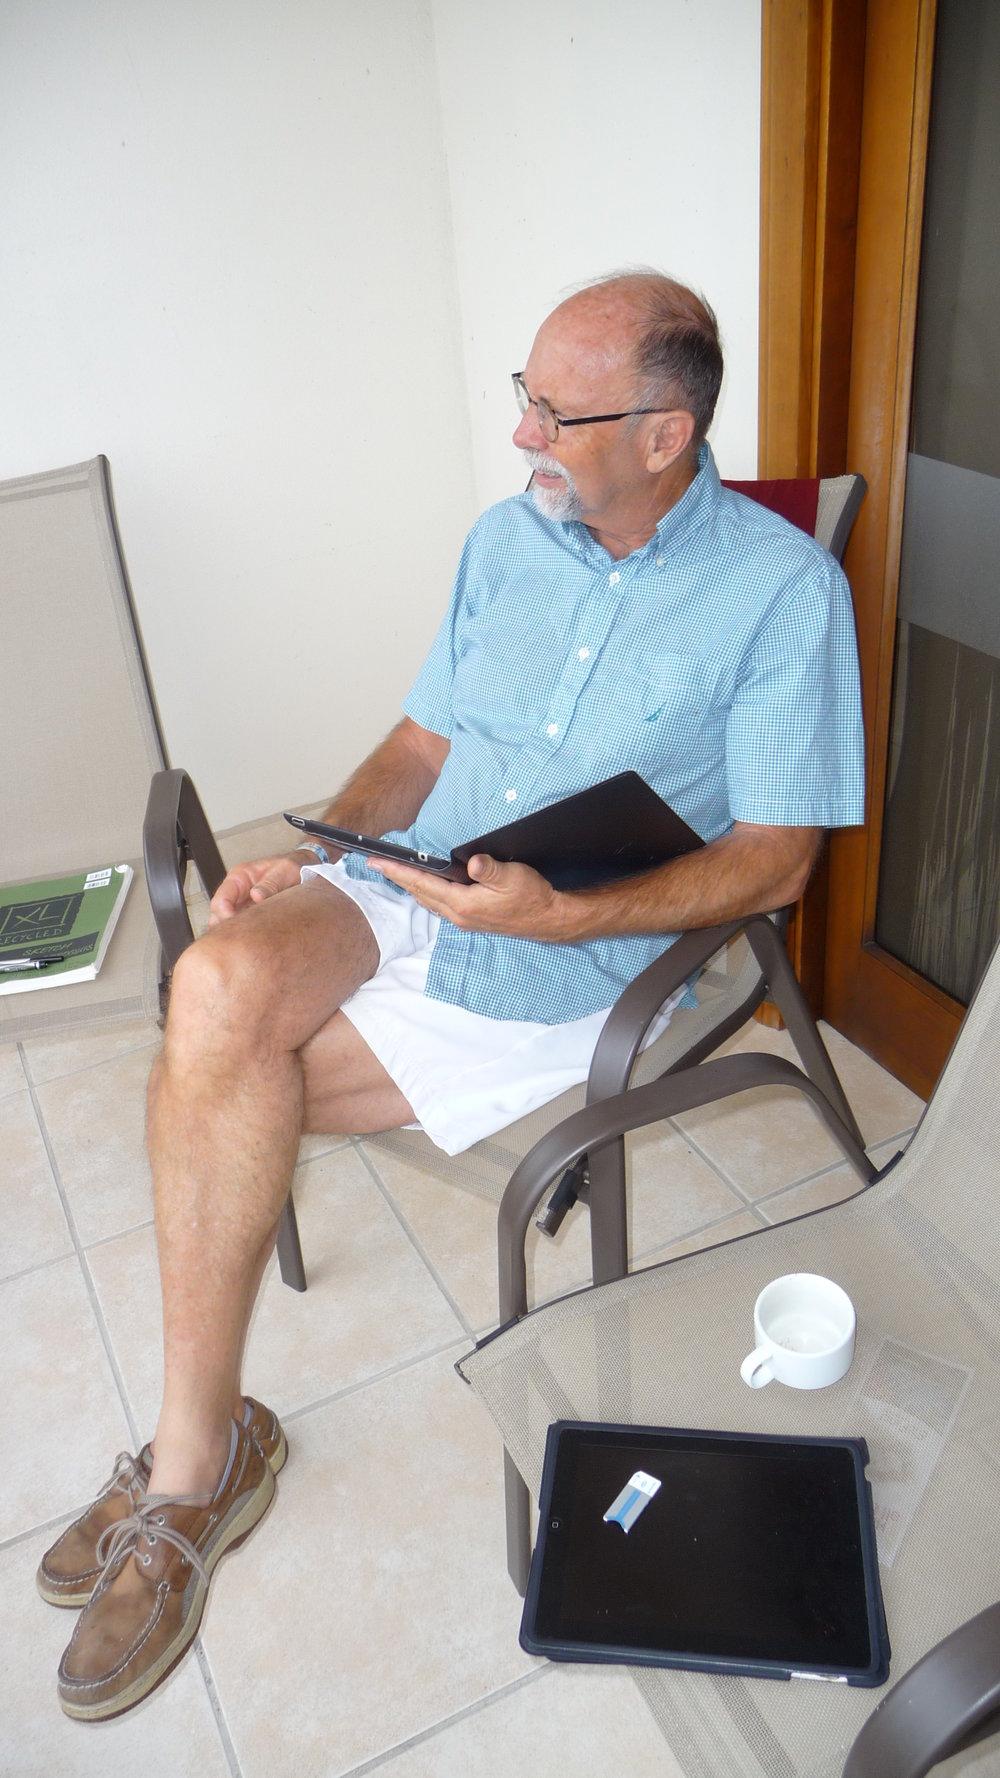 Mike Major sketching in Guanacaste Region, Costa Rica